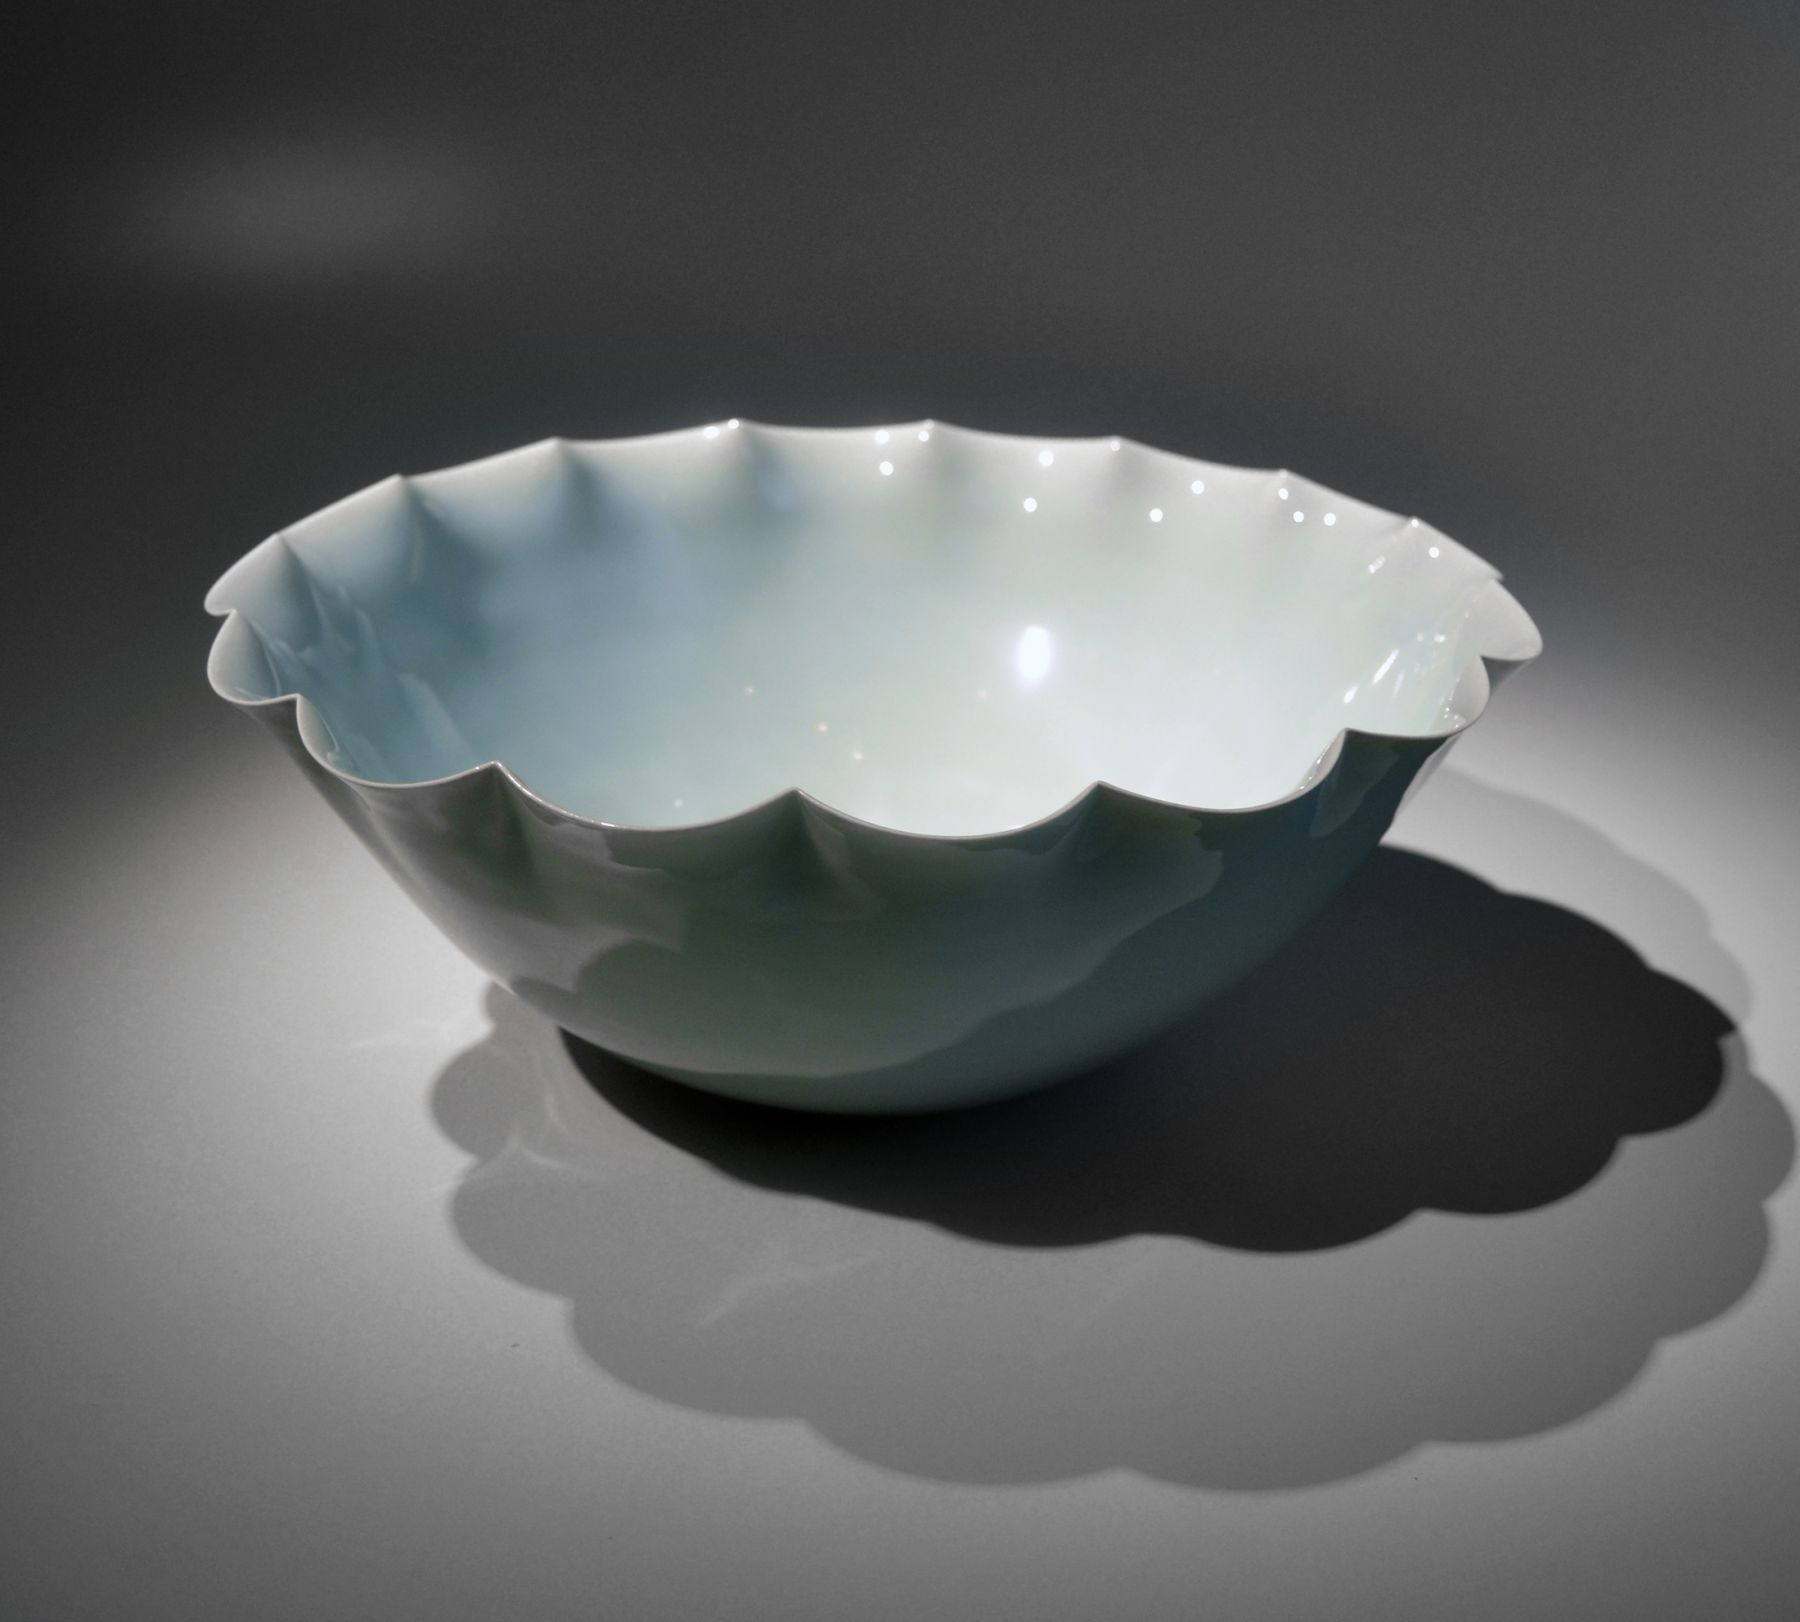 Kawase Shinobu (b. 1950), Large celadon bowl with foliated rim